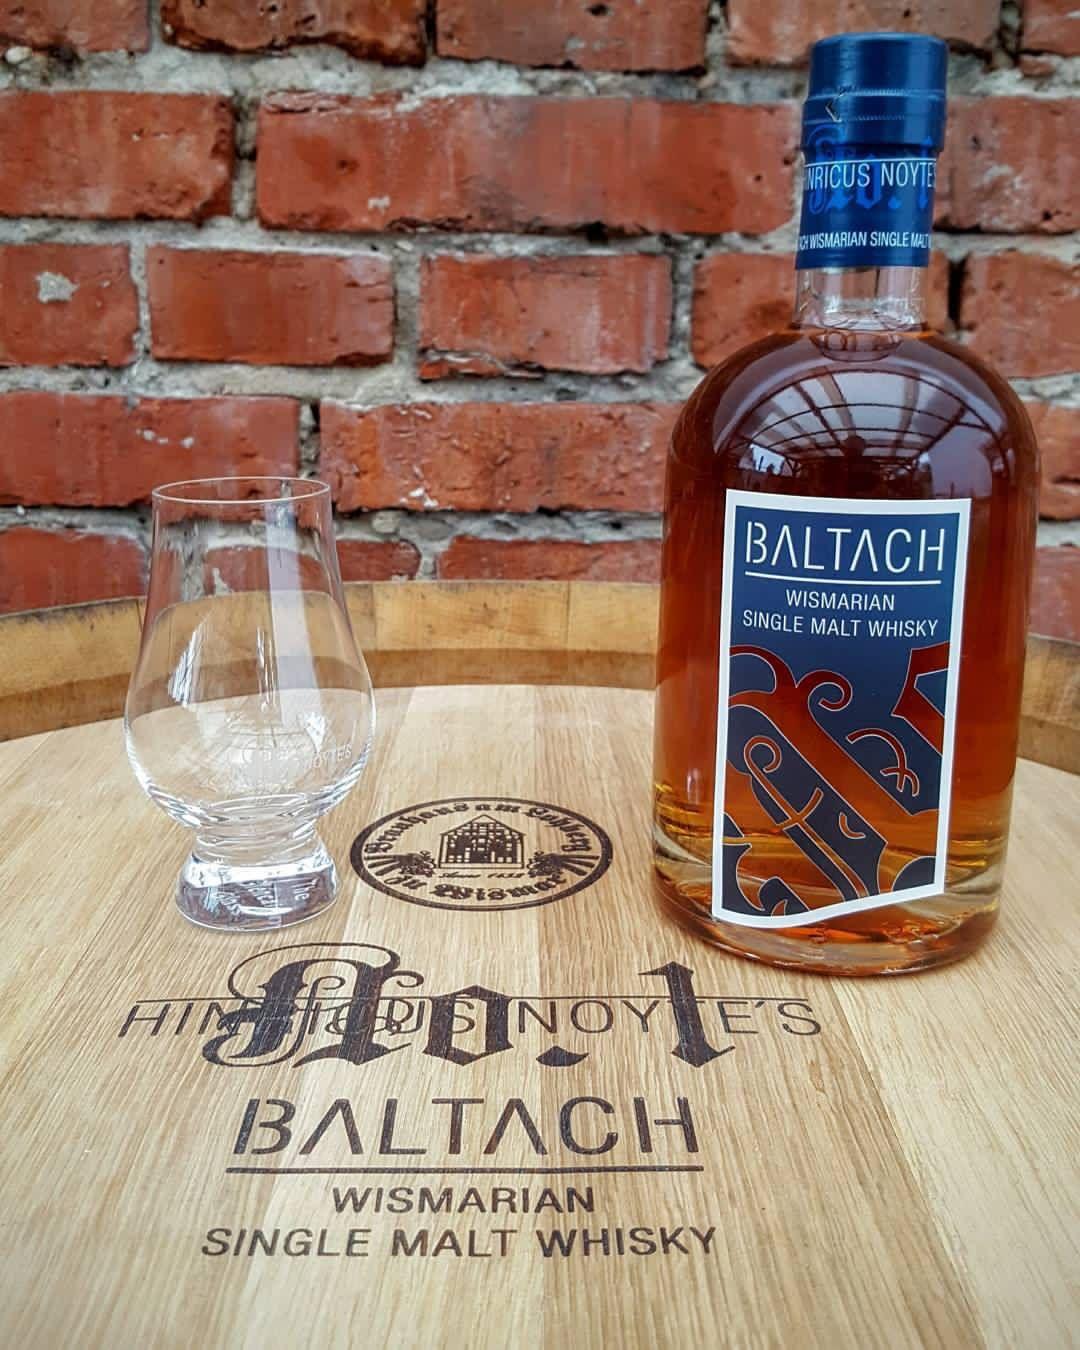 Baltach wismarian single malt